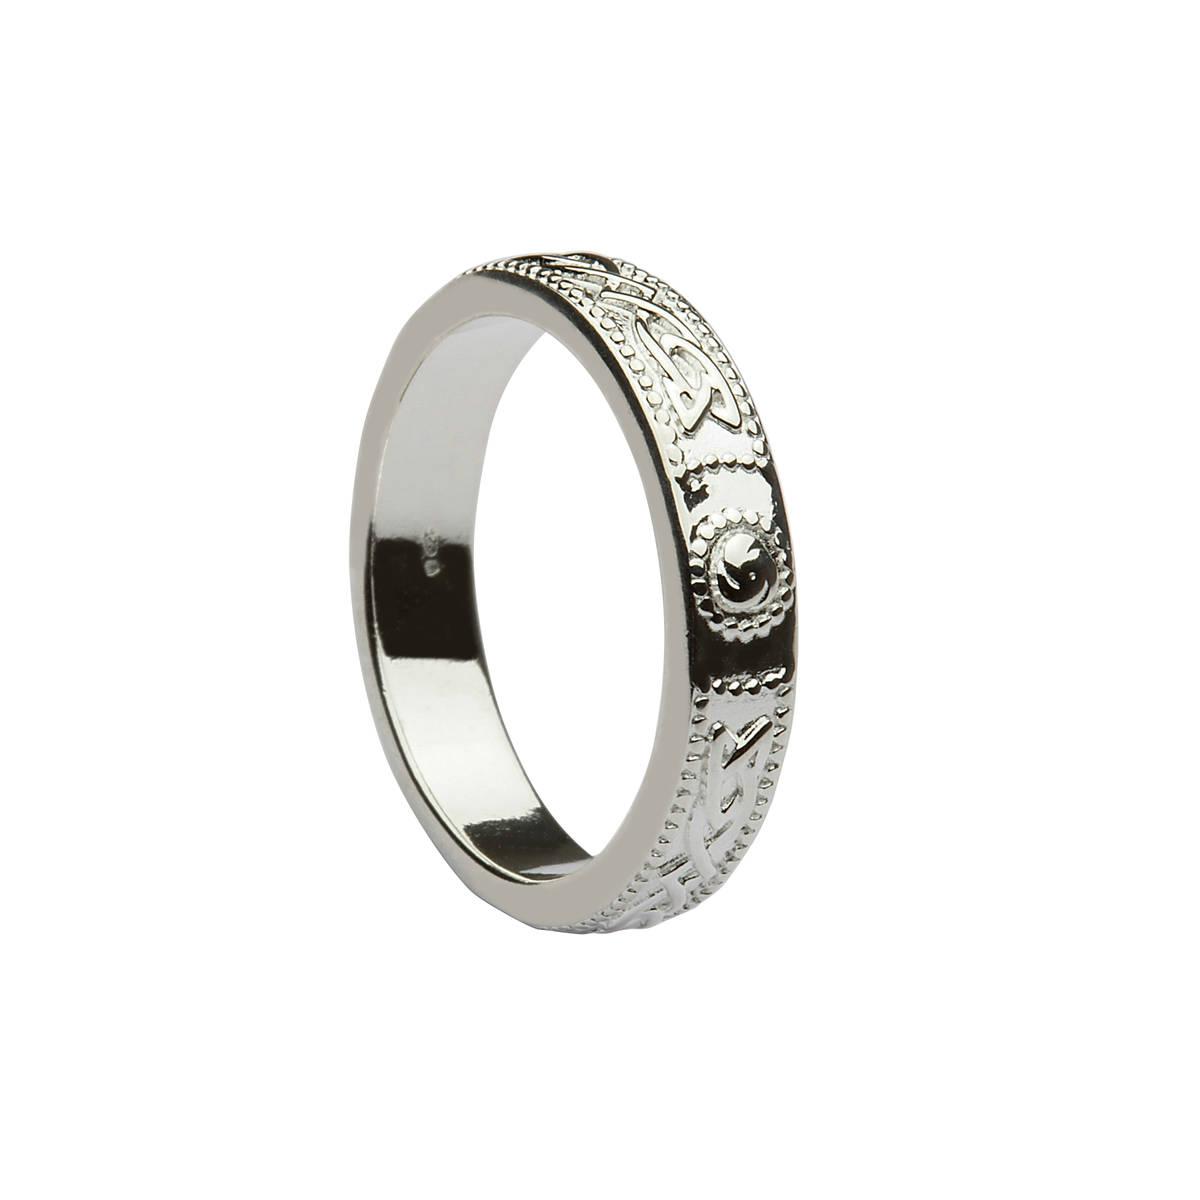 Silver classic Celtic design ring.